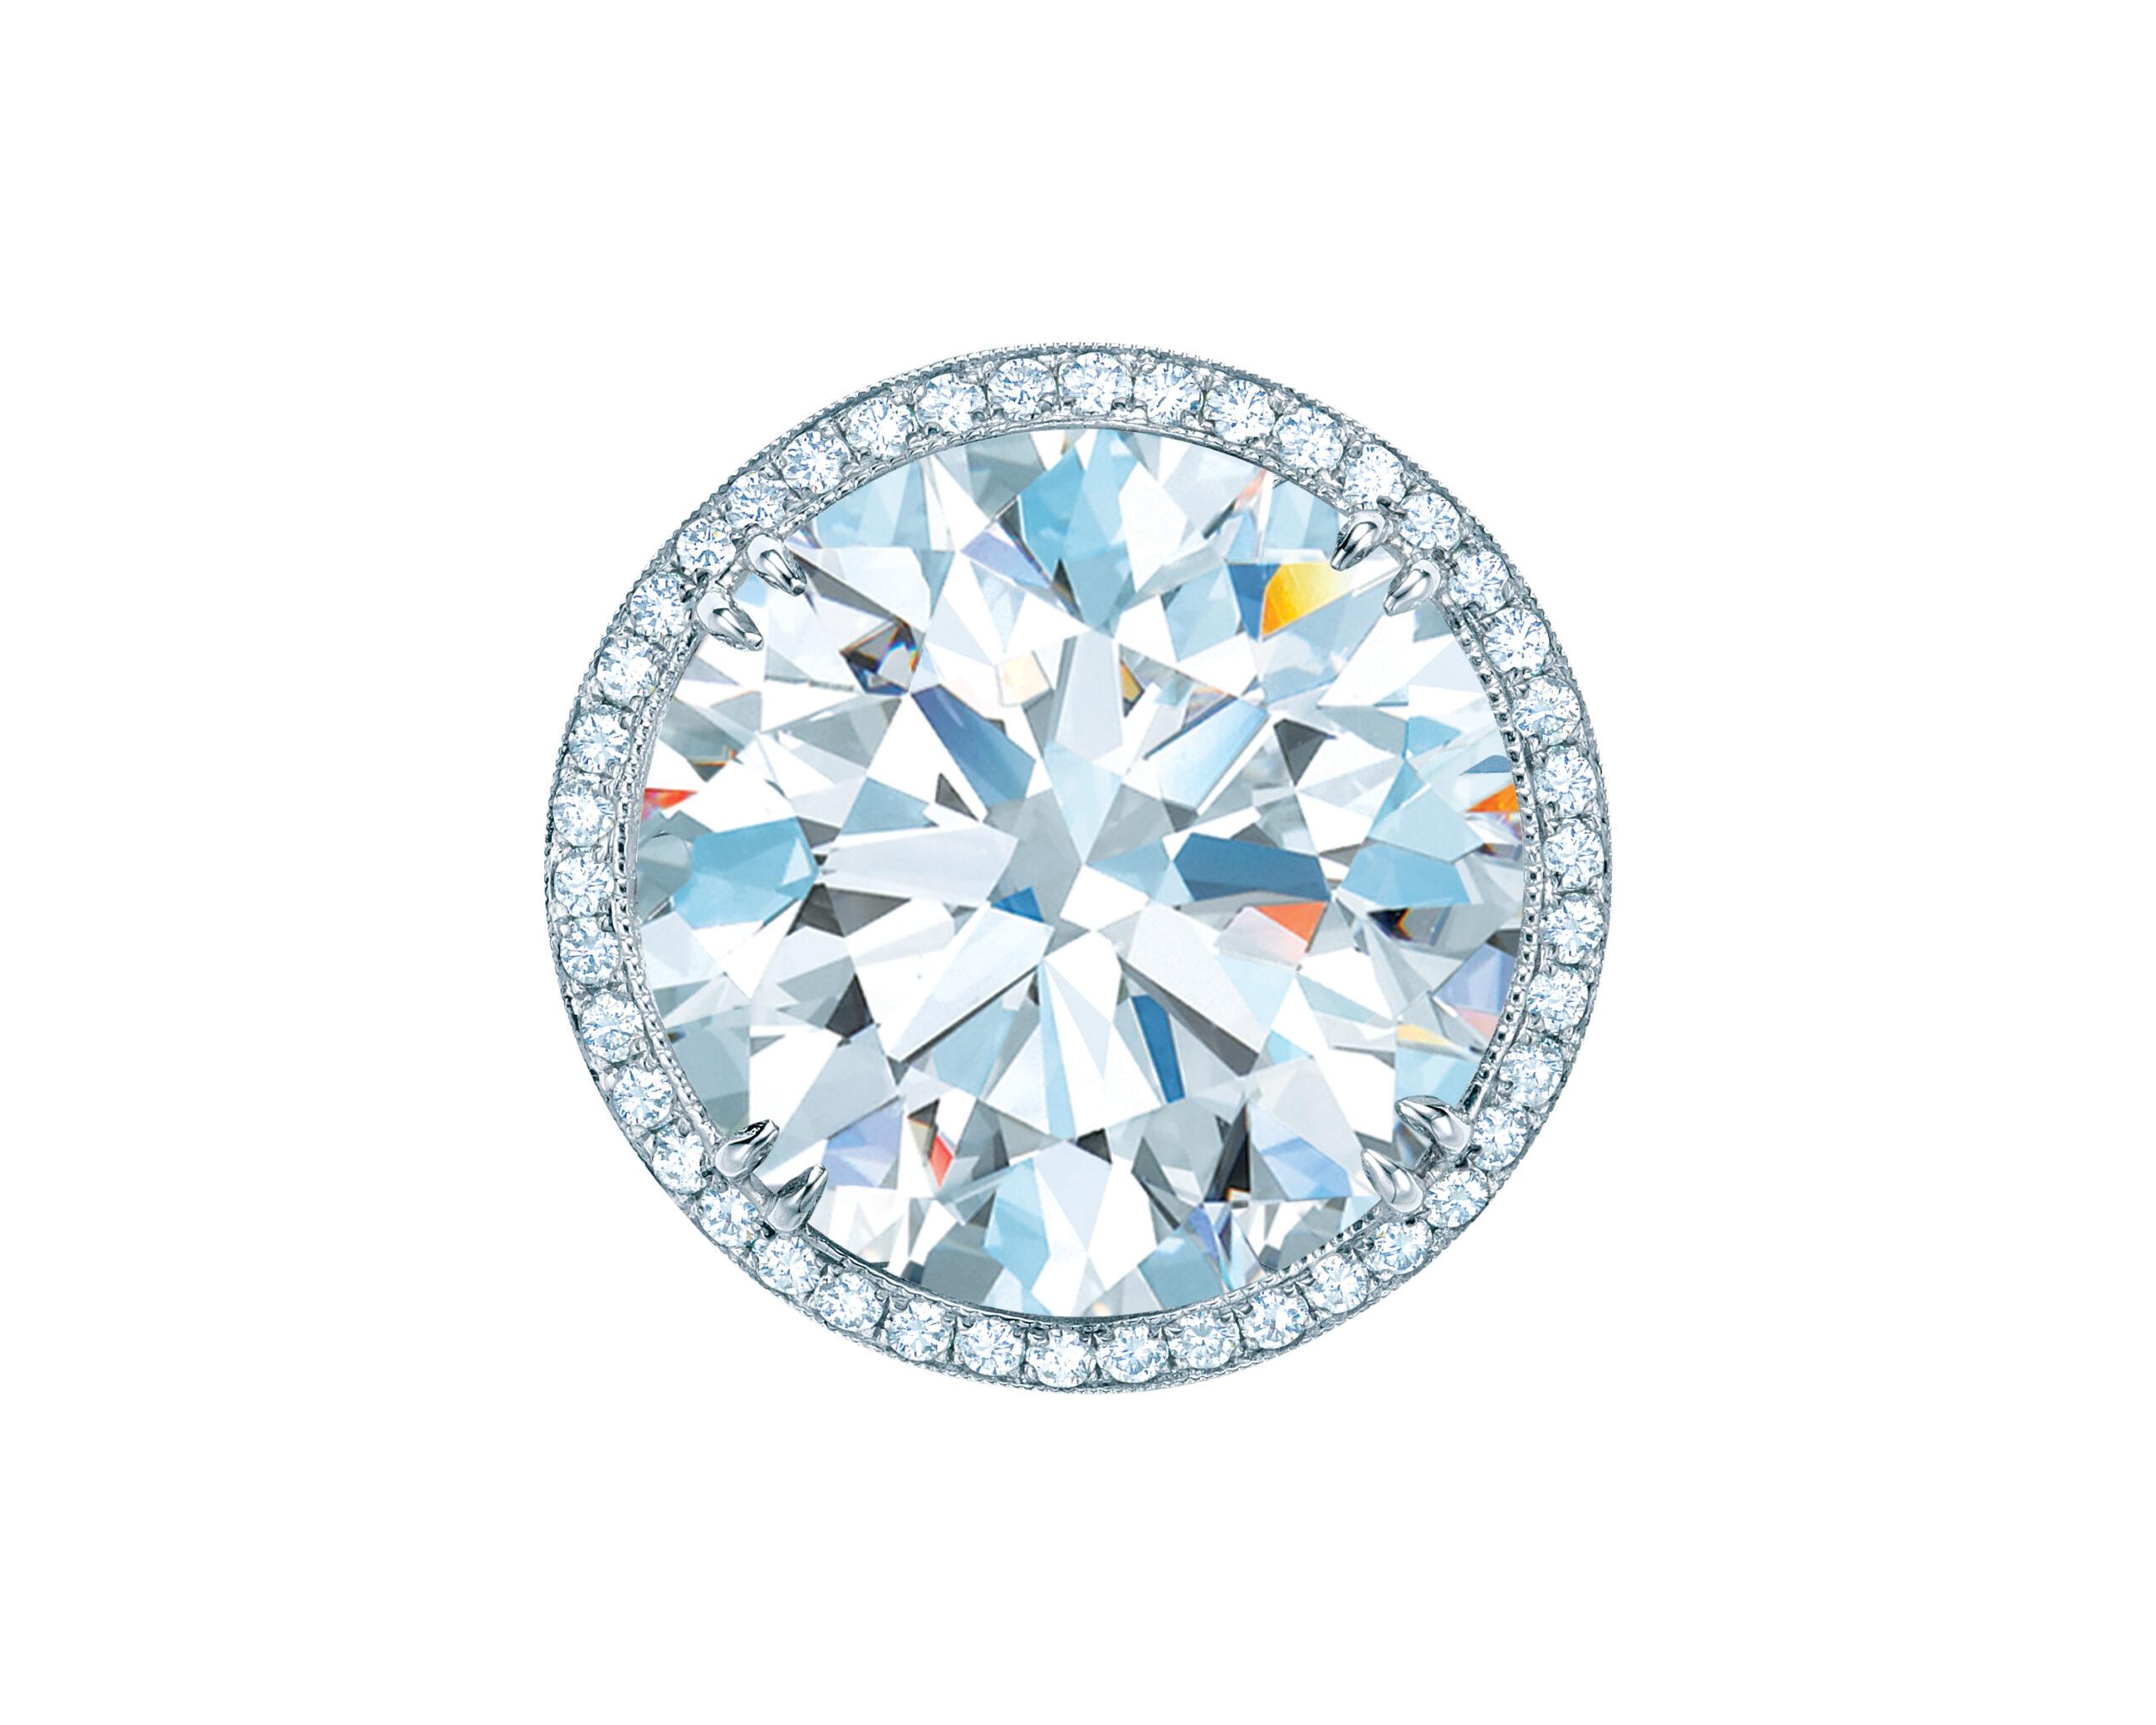 Tiffany round brilliant diamond ring in a diamond and platinum setting